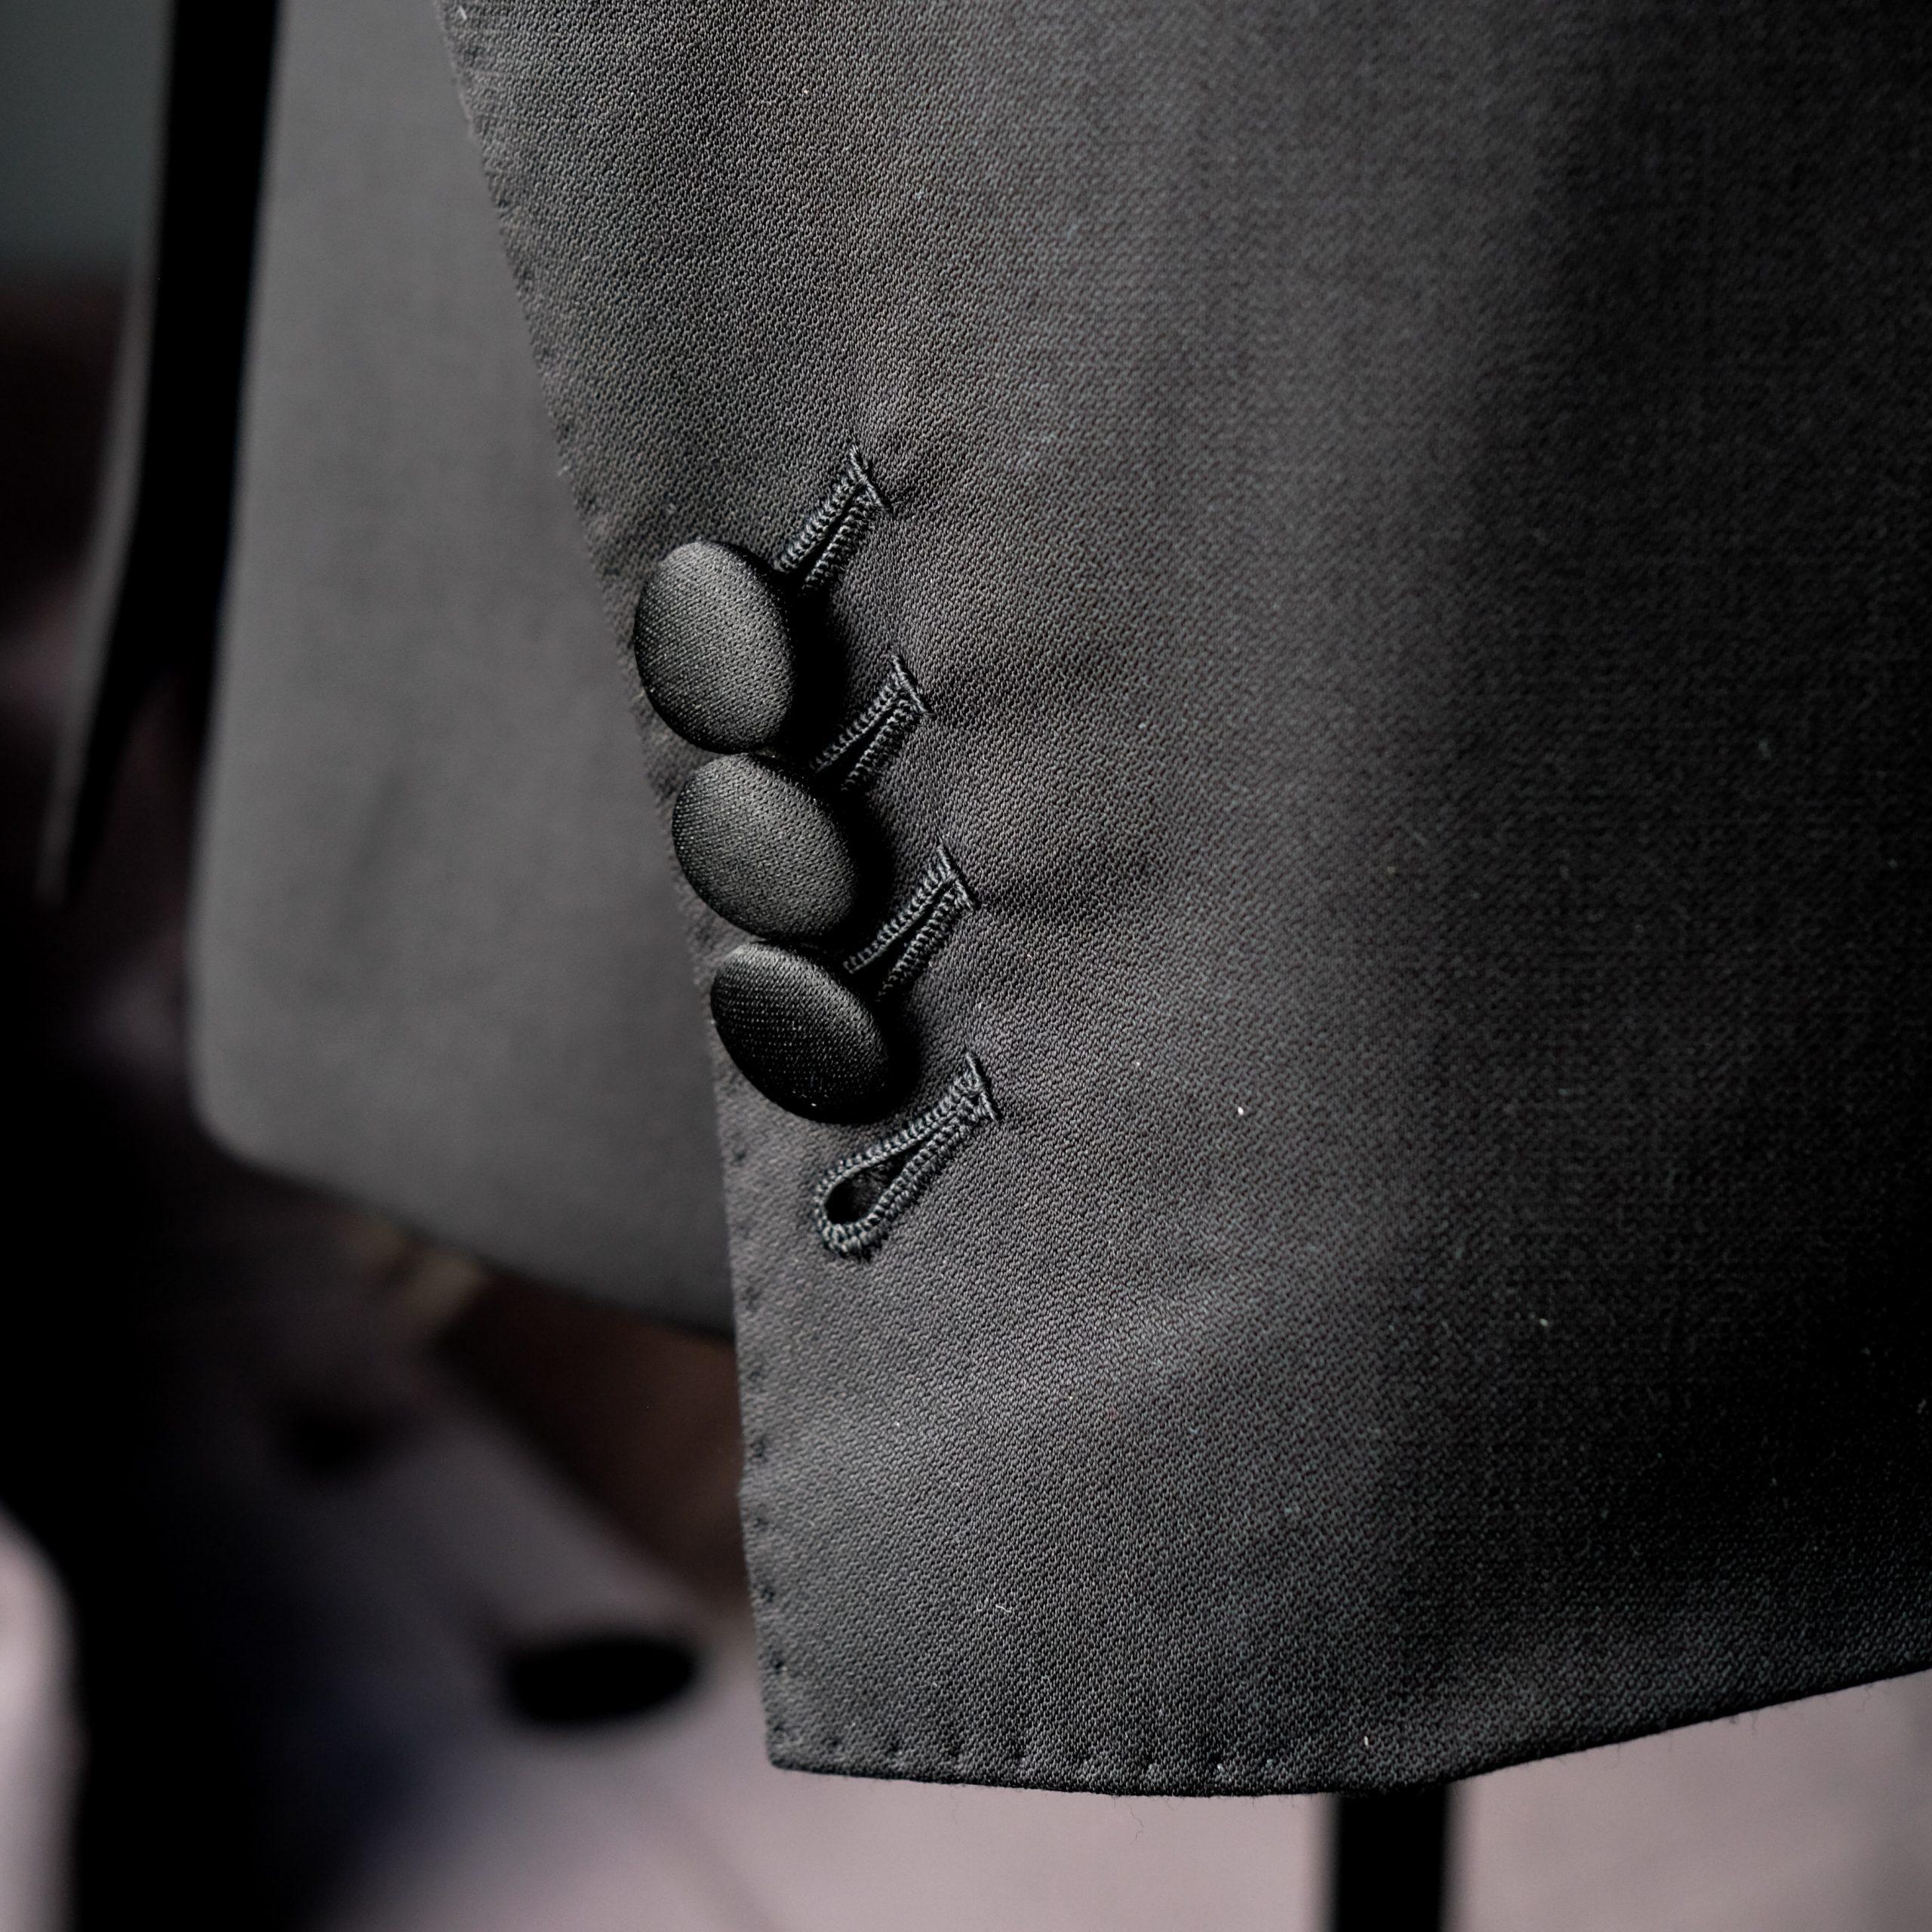 Satin Wrapped Tuxedo Jacket Buttons